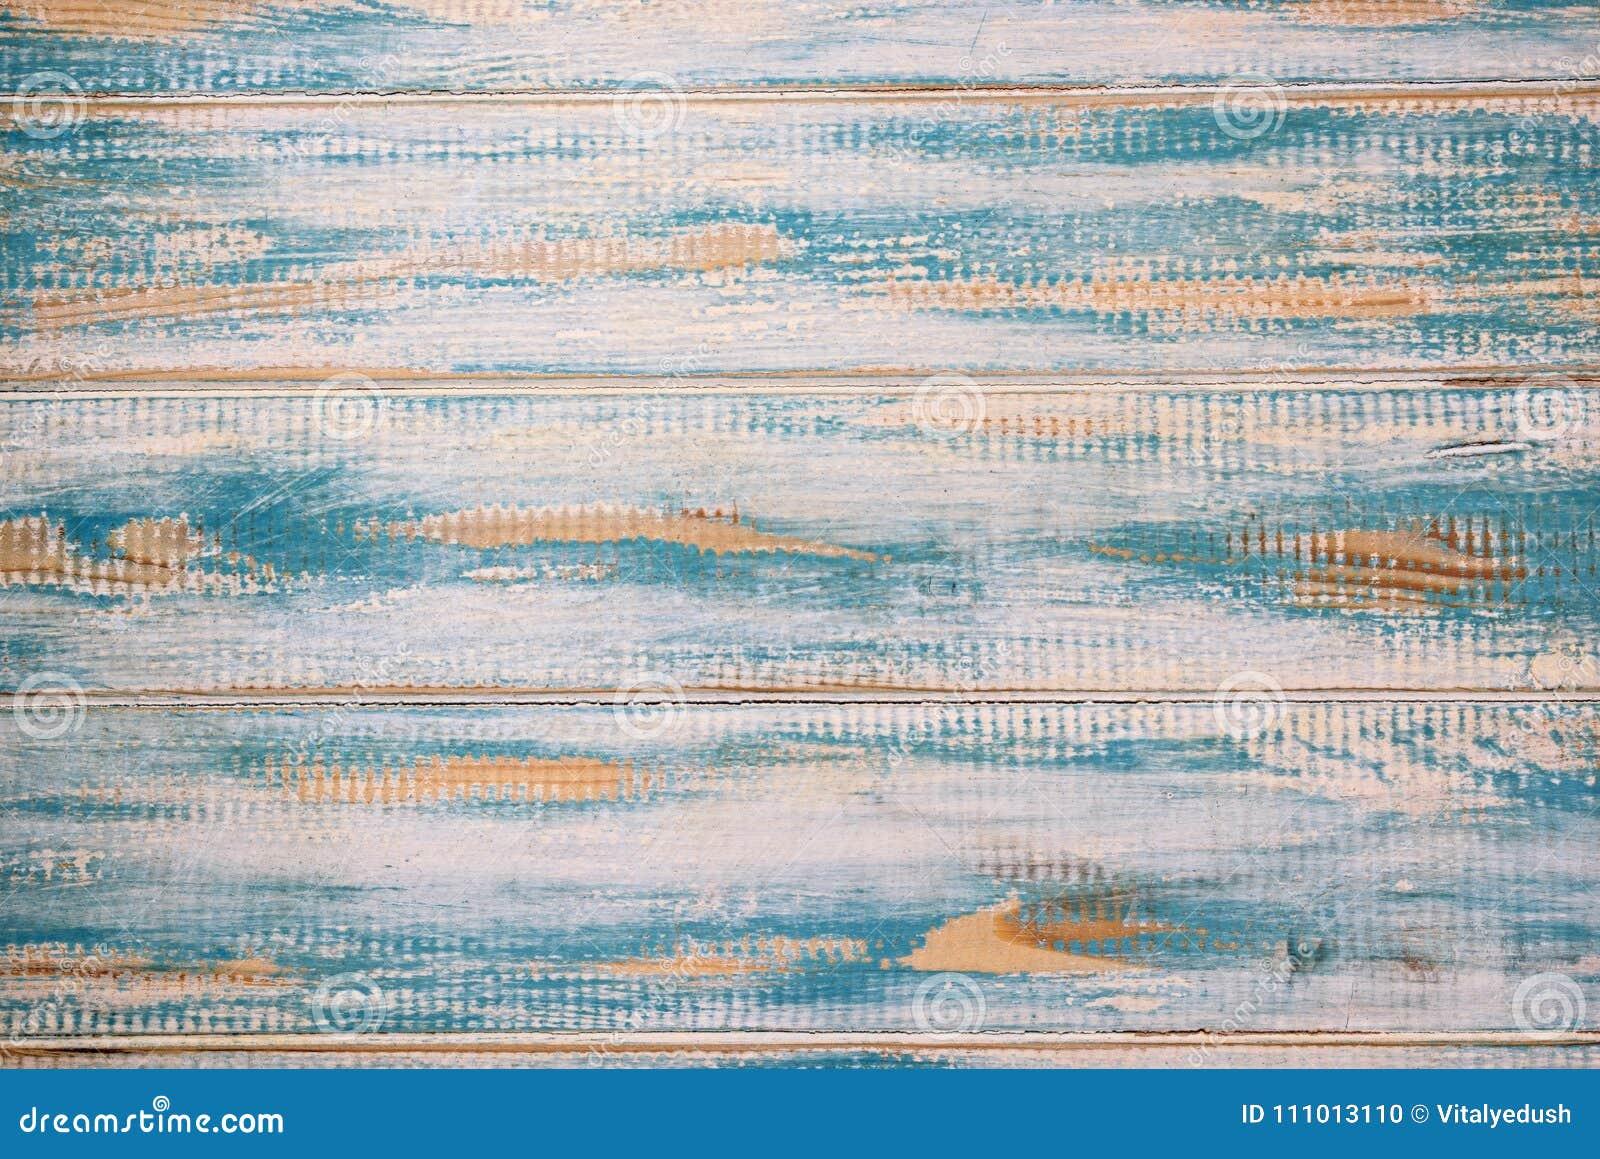 Rustic Barn Wood Art Texture Wallpaper Background Stock